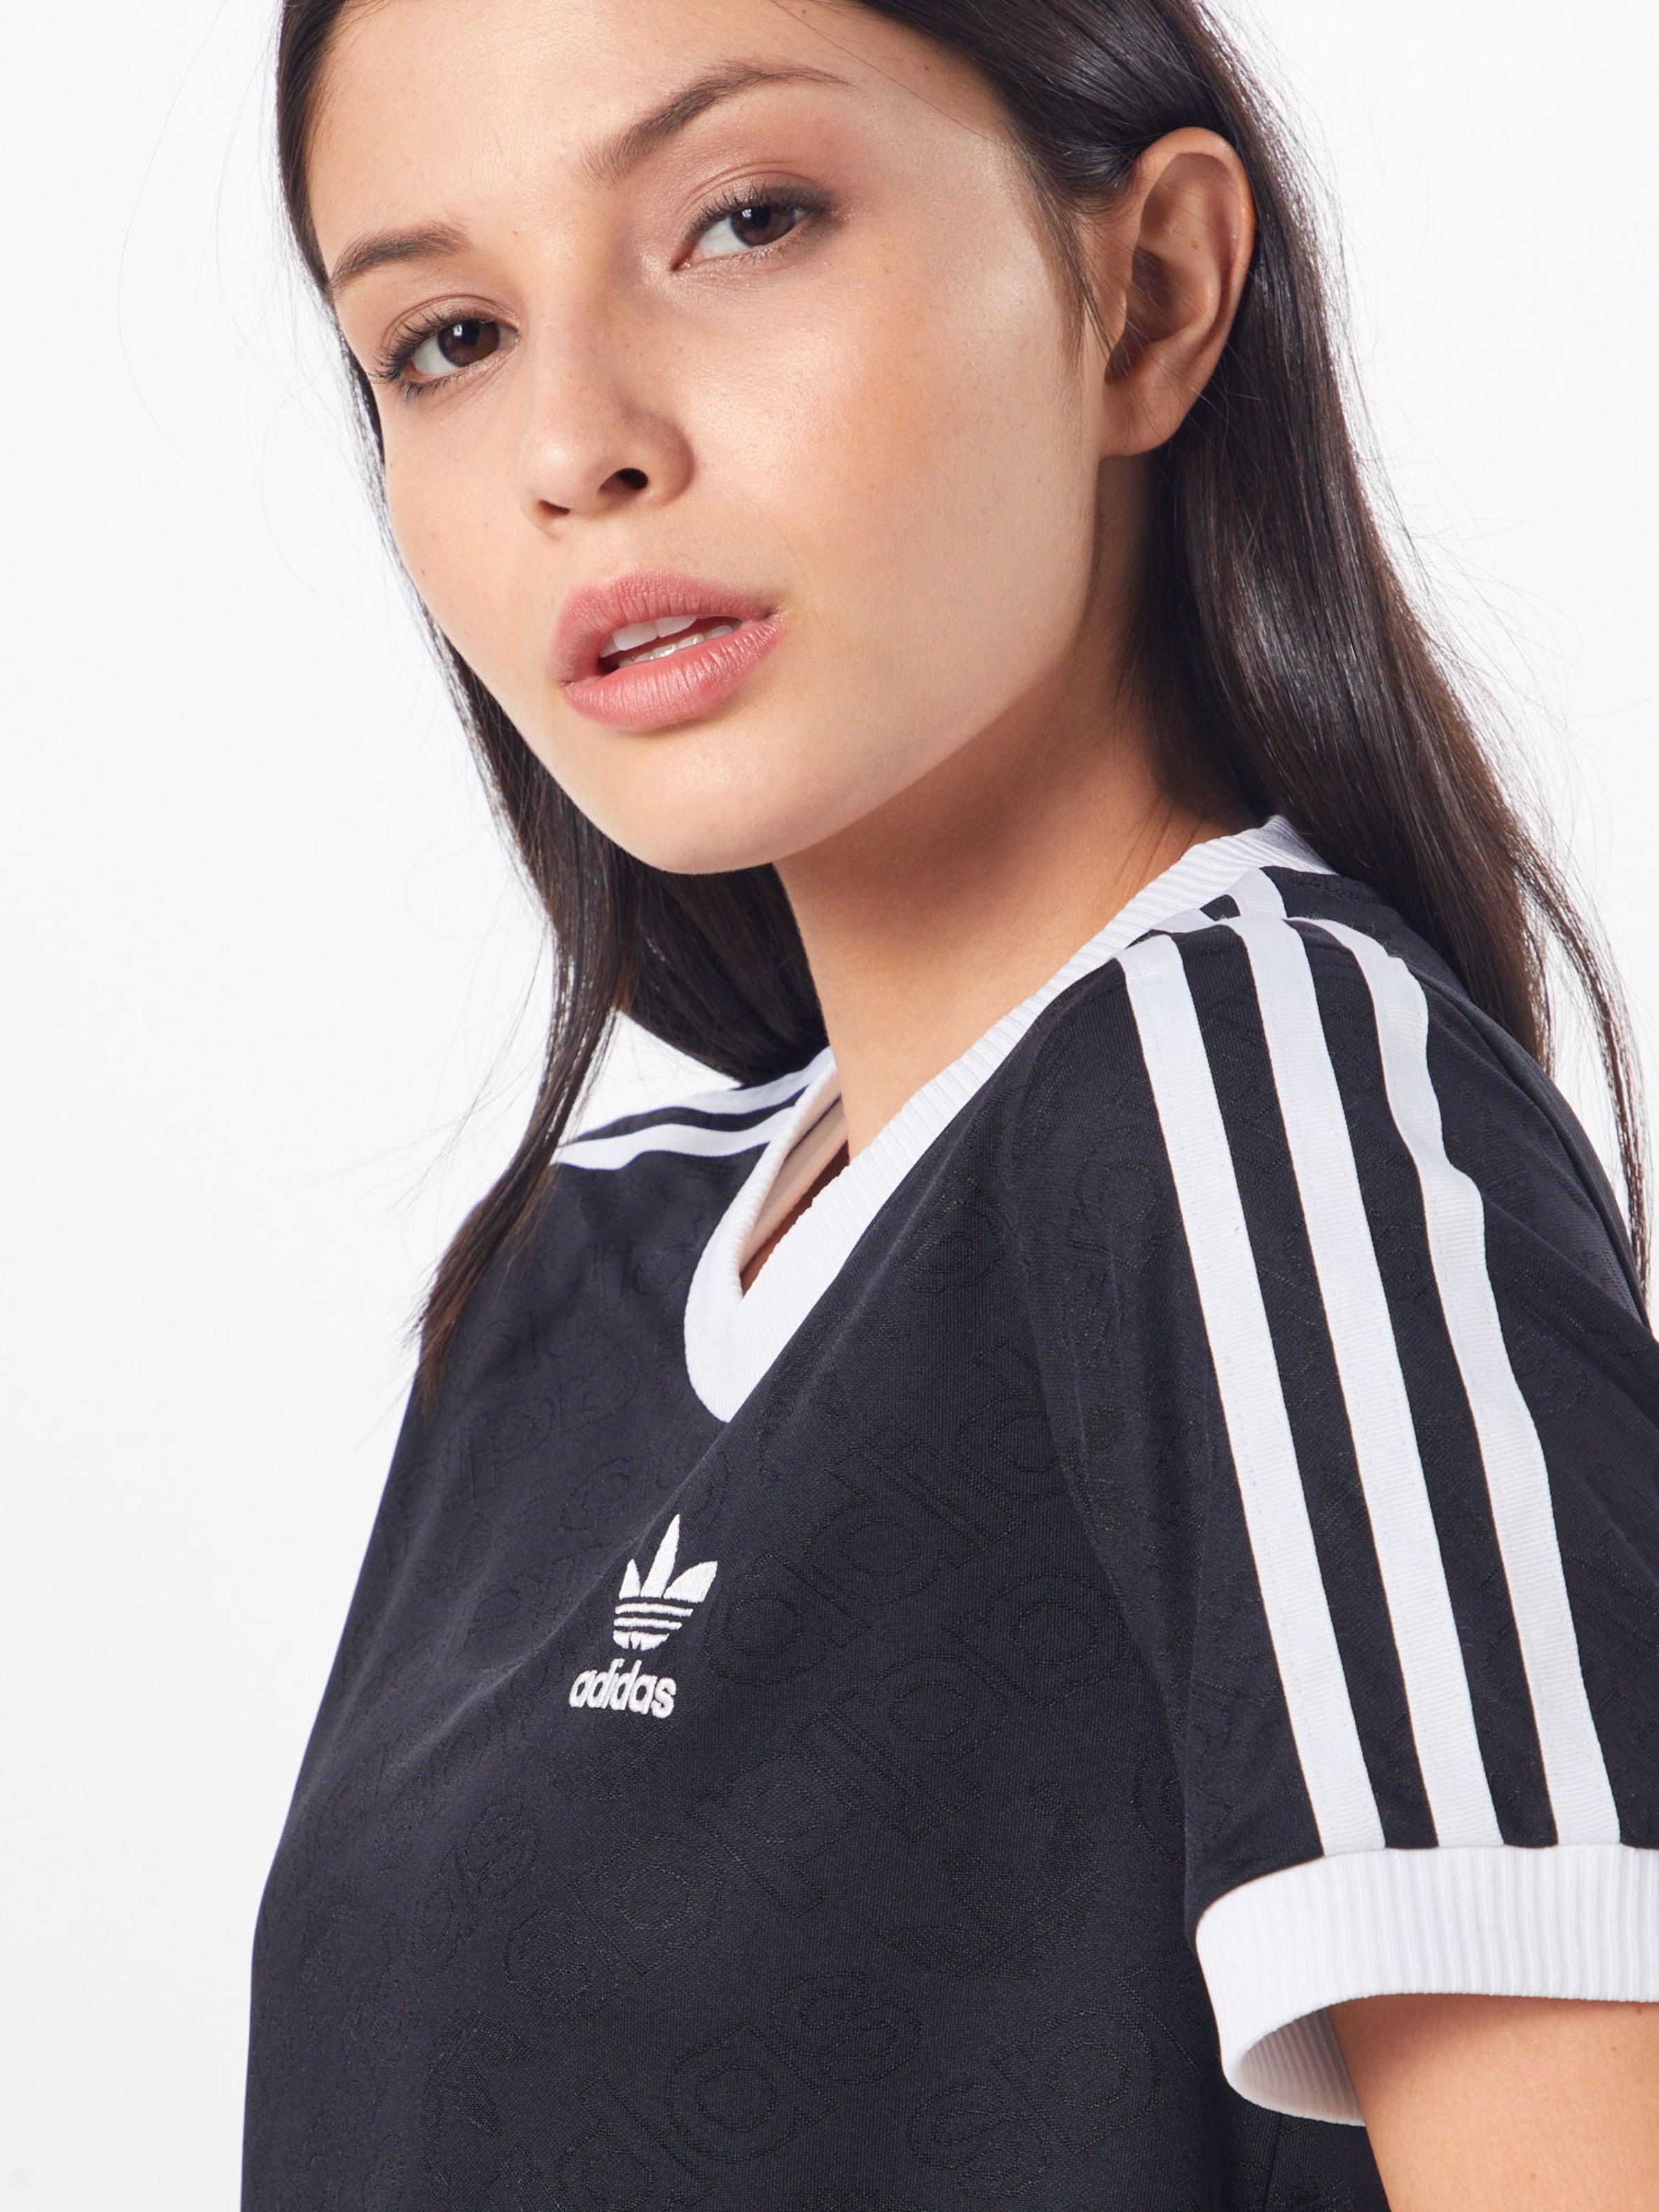 Originals shirt Adidas En NoirBlanc T '3 stripes' X08wOPkn